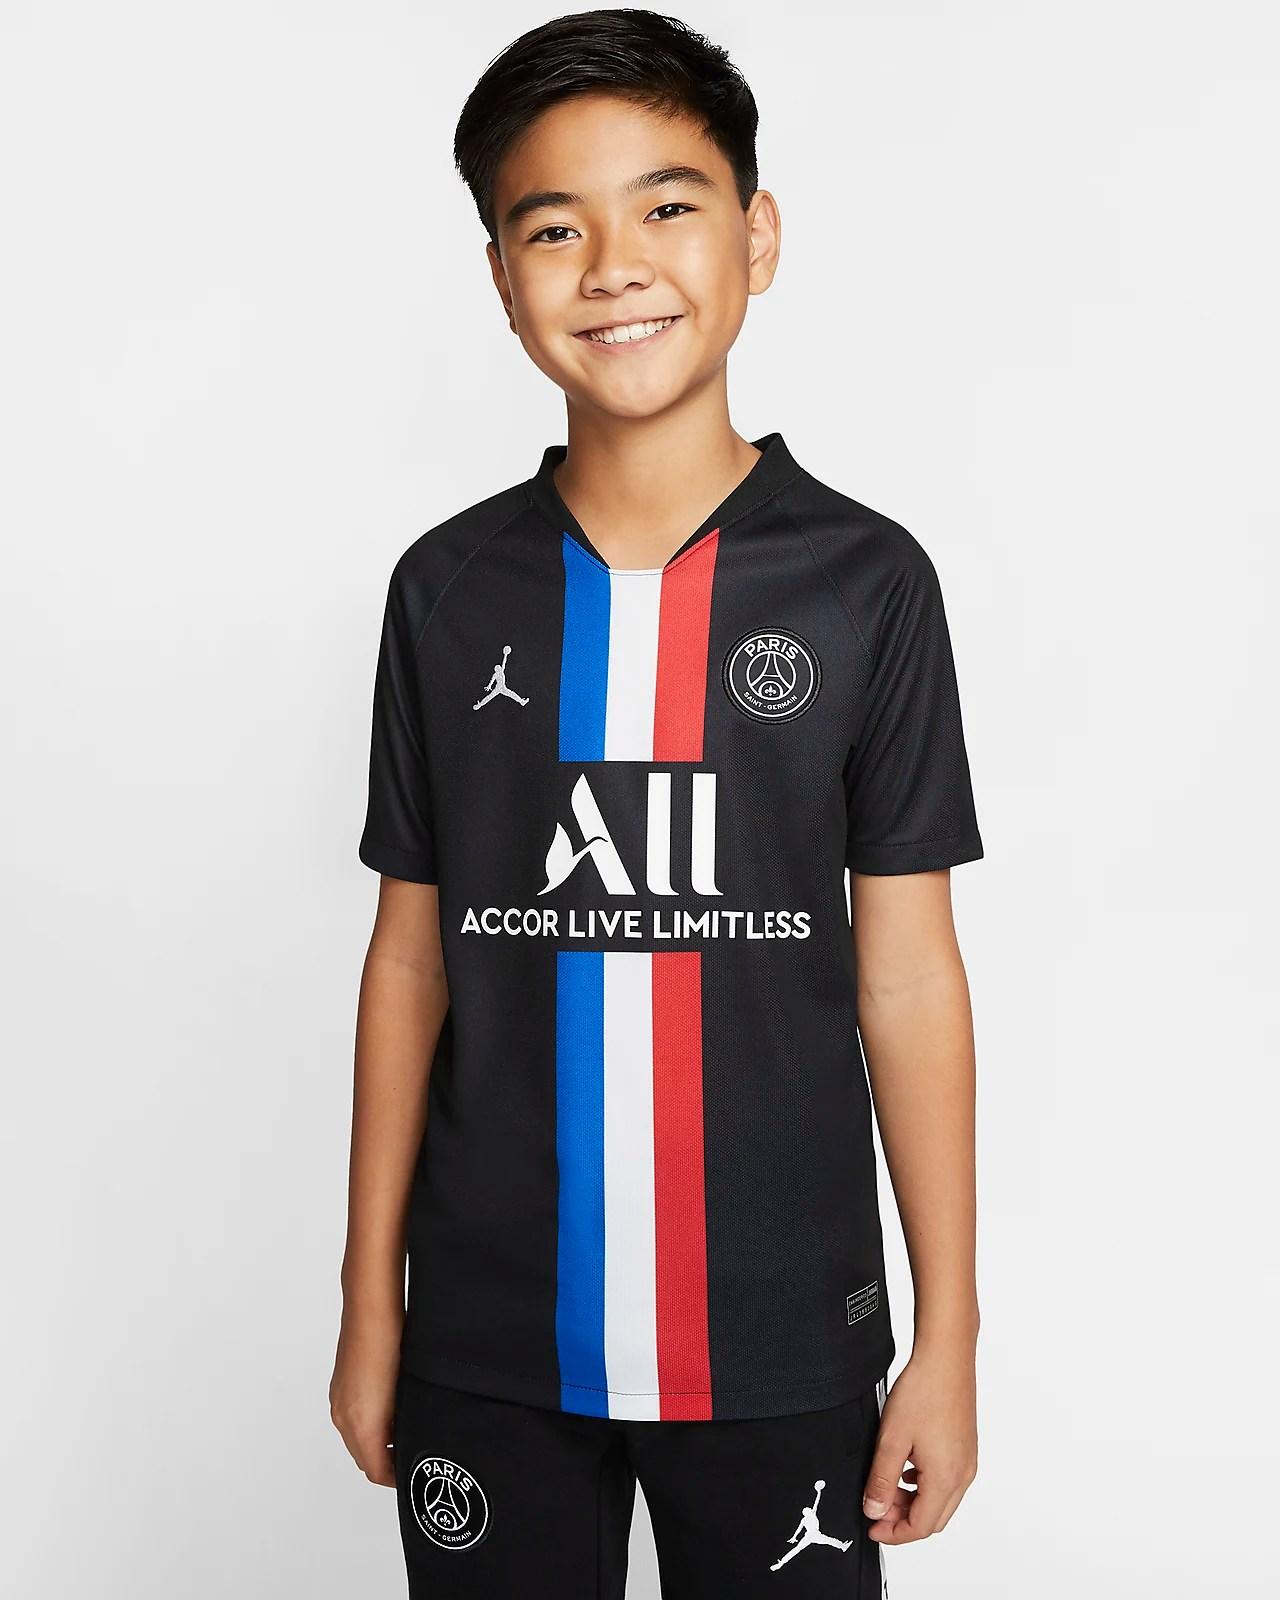 jordan x paris saint germain 2019 20 stadium away fussballtrikot fur altere kinder